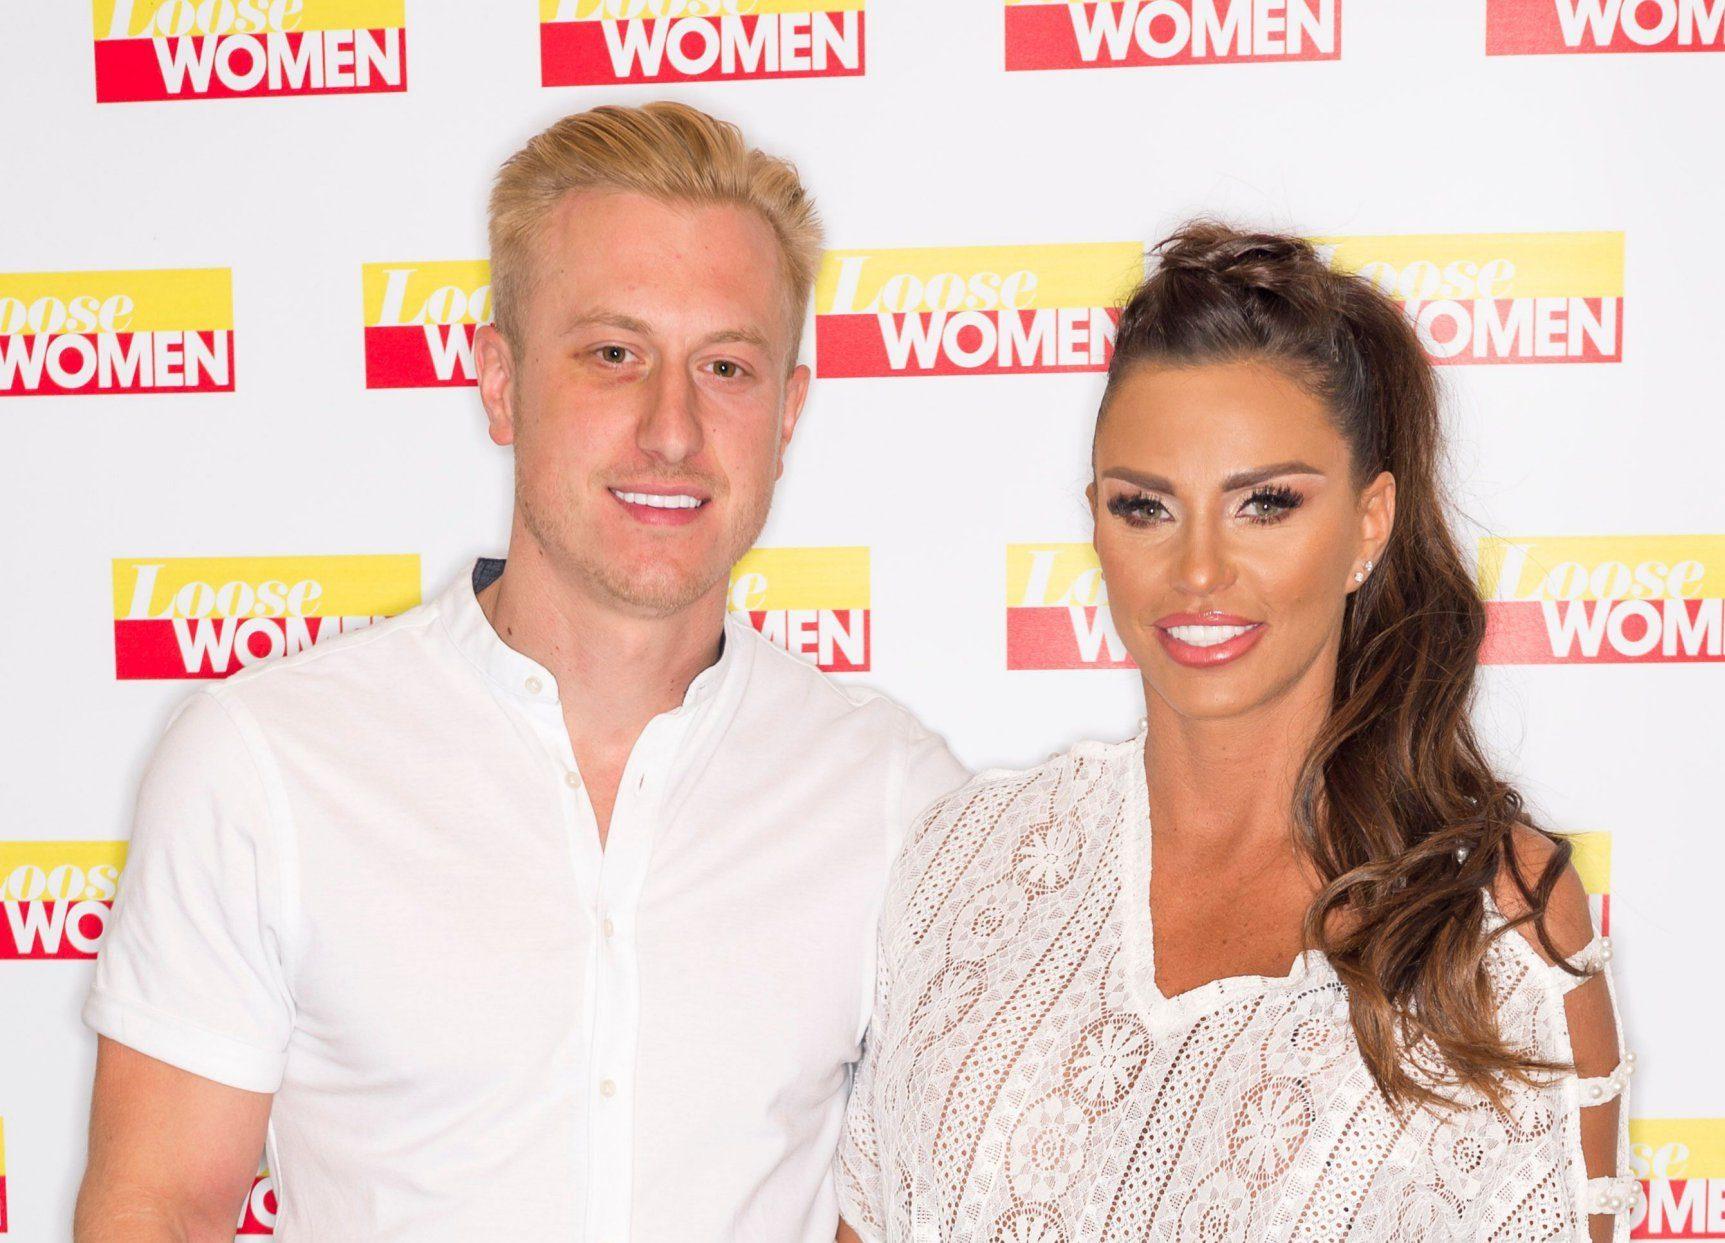 Katie Price 'inspires boyfriend Kris Boyson to get new set of teeth'